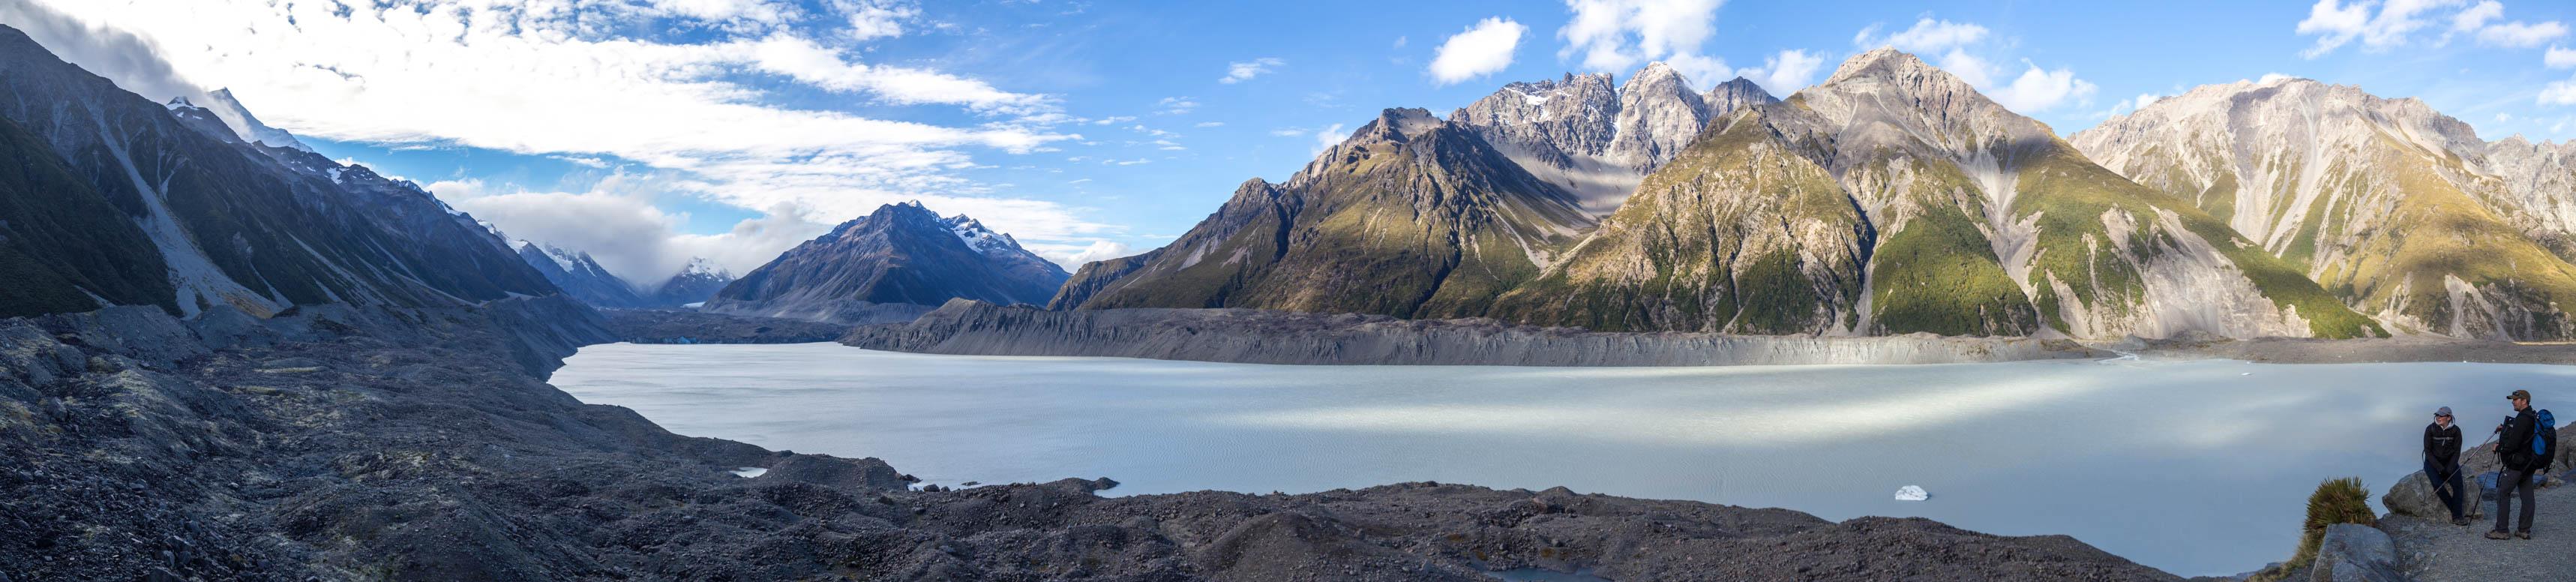 Gletschertal Tasman